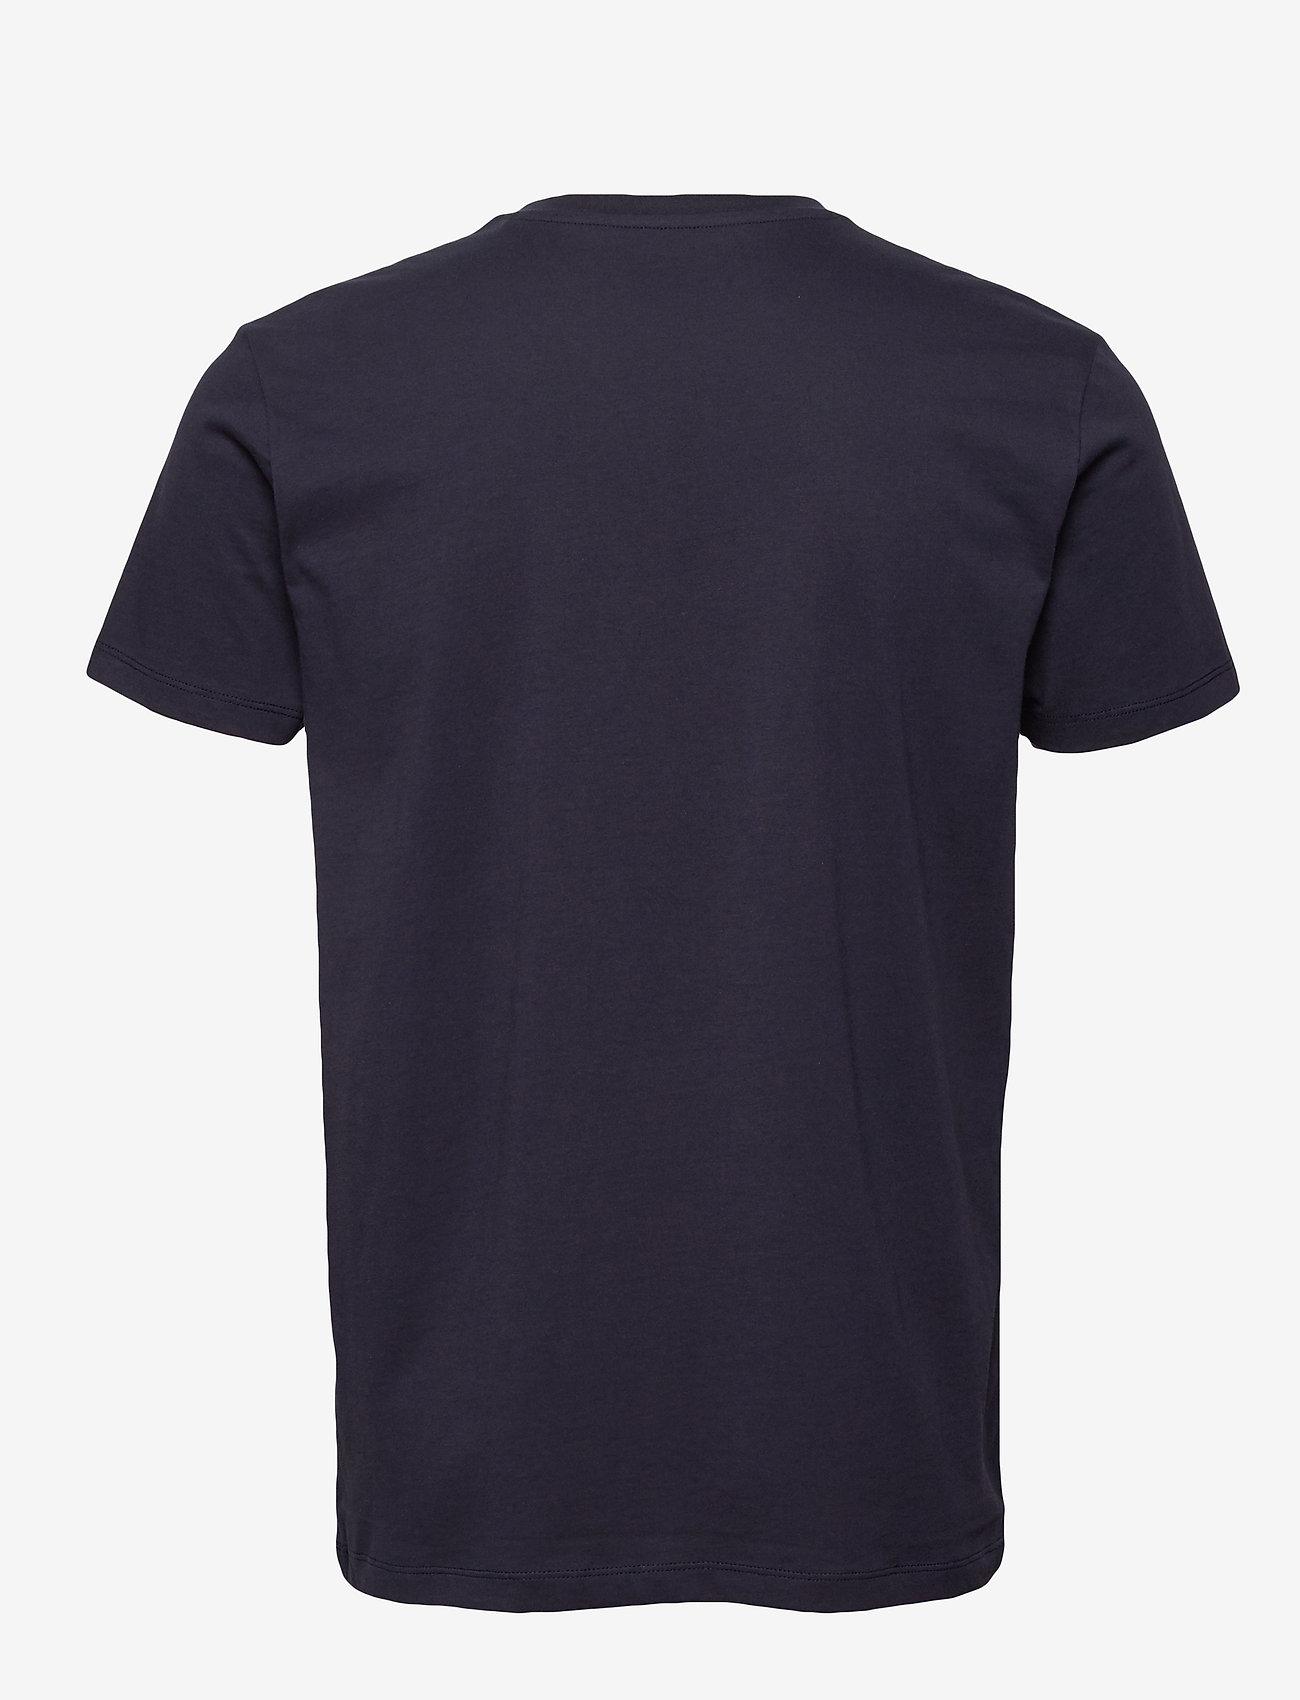 Esprit Casual - T-Shirts - t-shirts basiques - navy - 1